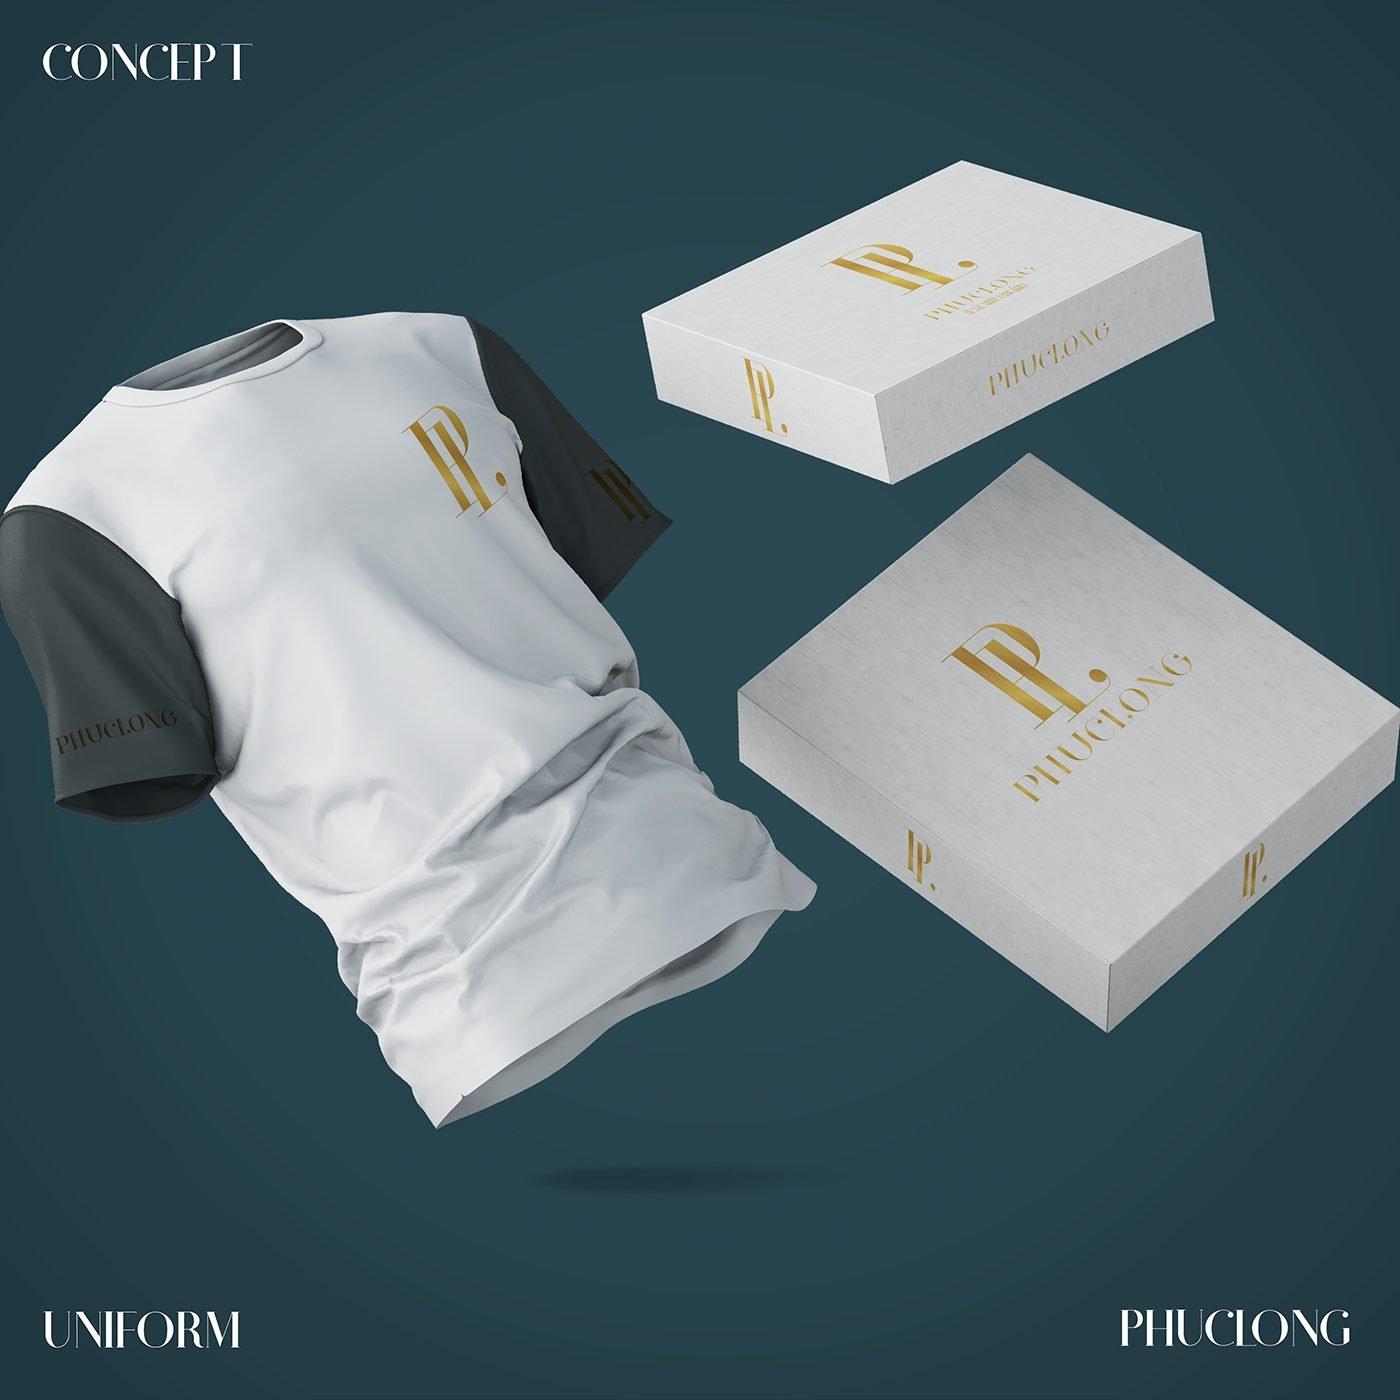 brand uniform design identity branding design branding logo design in saigon visual identities in ho chi minh corporate logo logo graphic design and branding web design in Saigon Helixgram